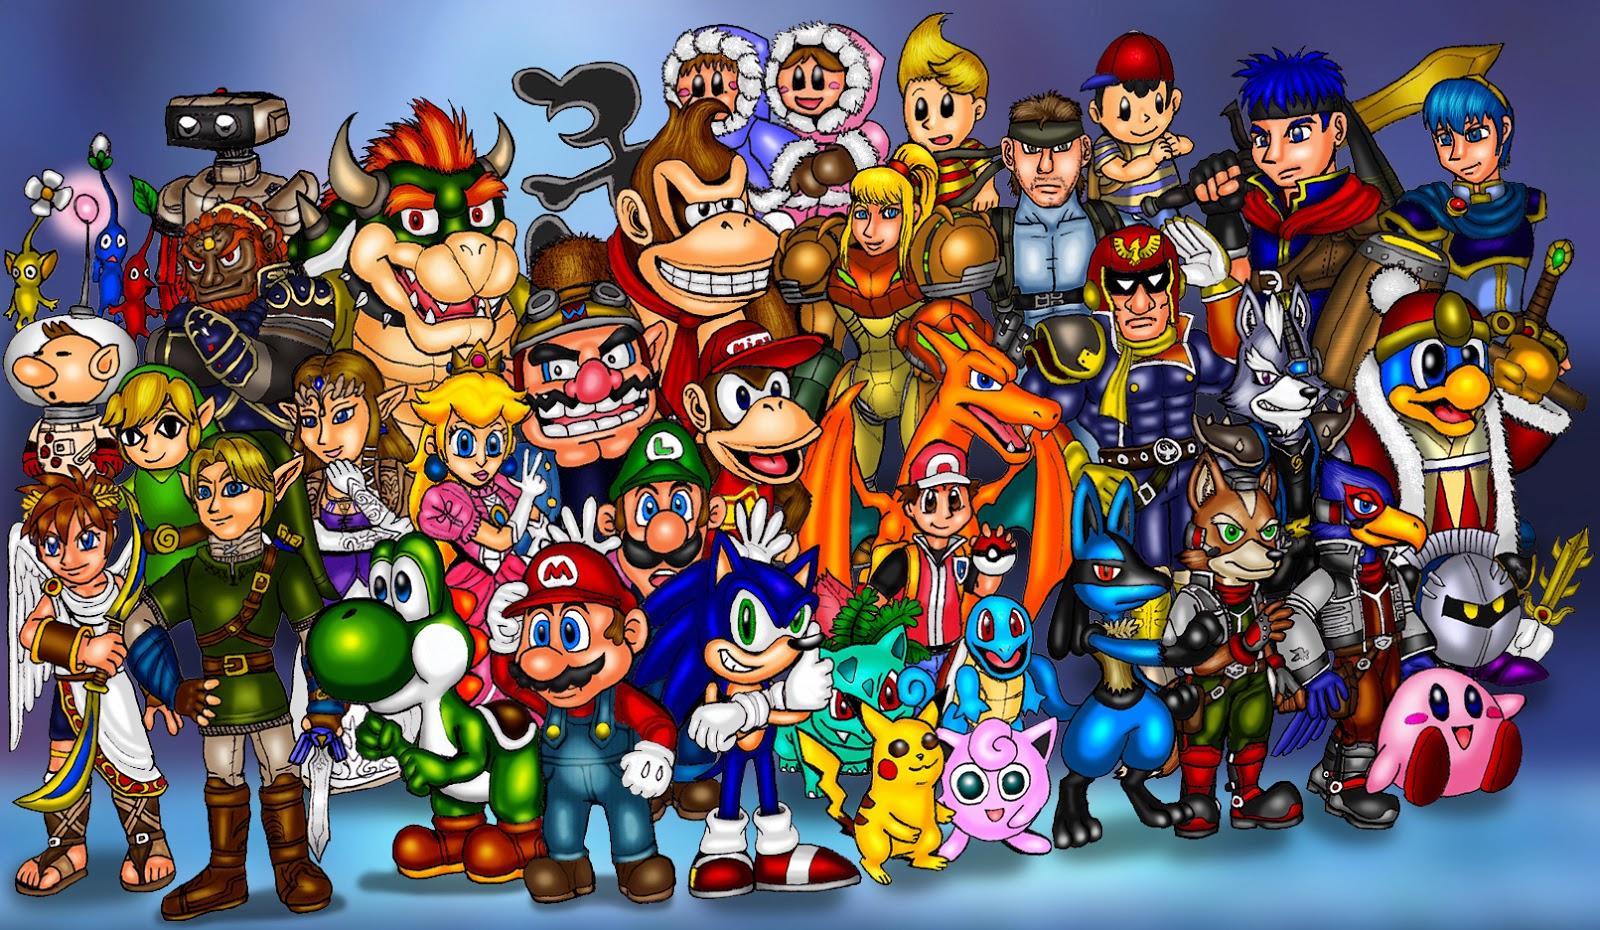 Smashing Characters - Super Smash Bros. Brawl Wallpaper